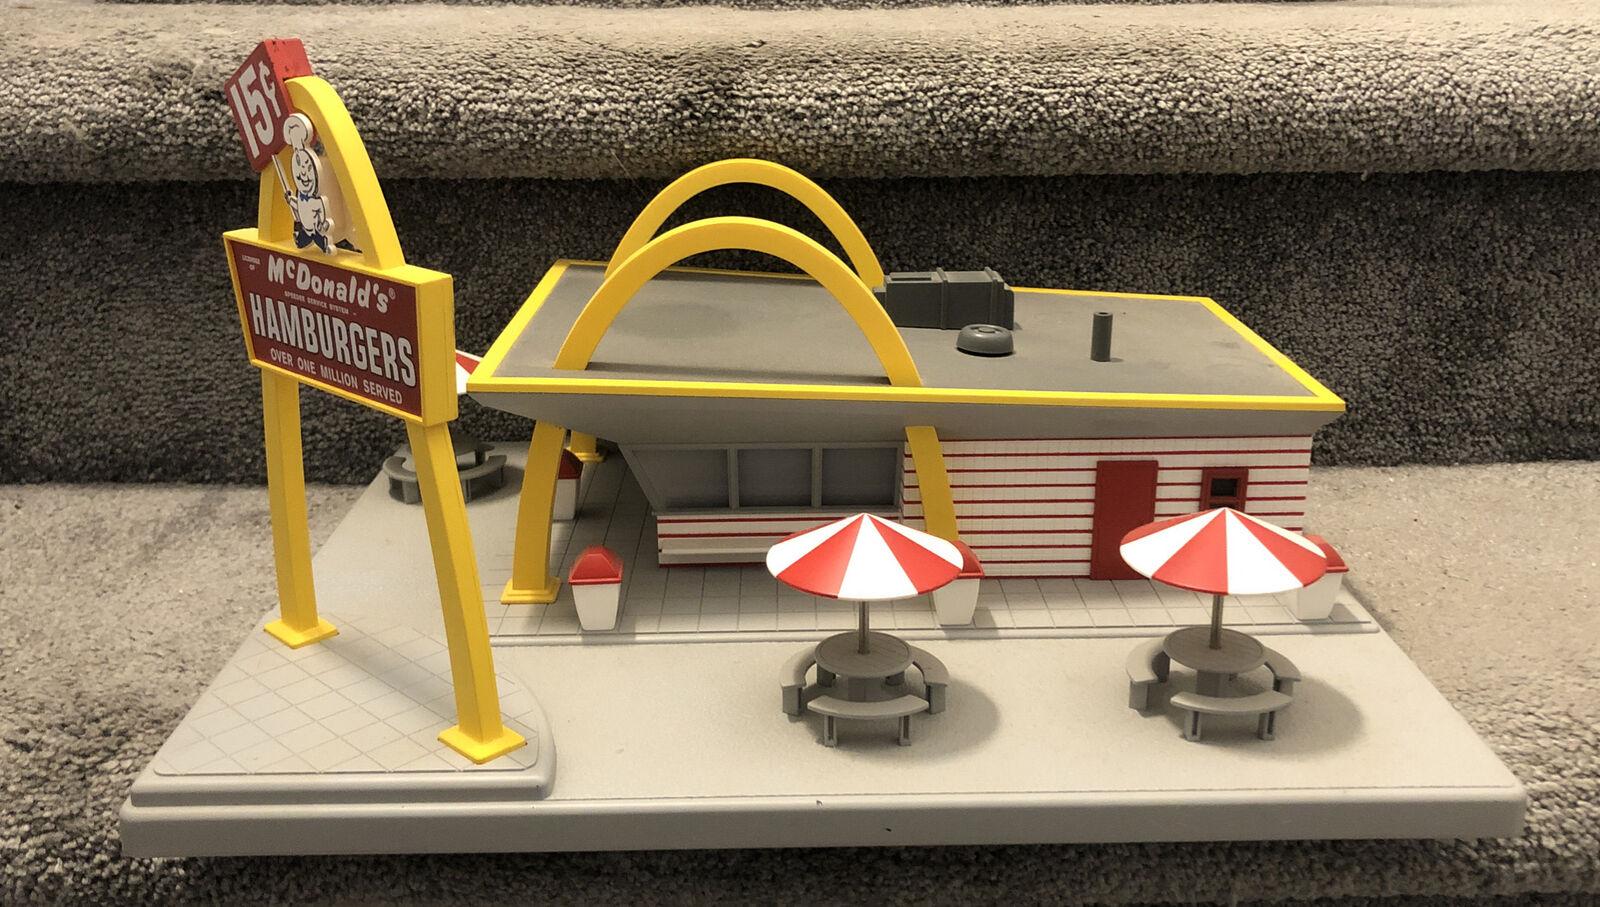 MTH Rail King Original Mcdonald/'s Restaurant Building 30-9034 for sale online